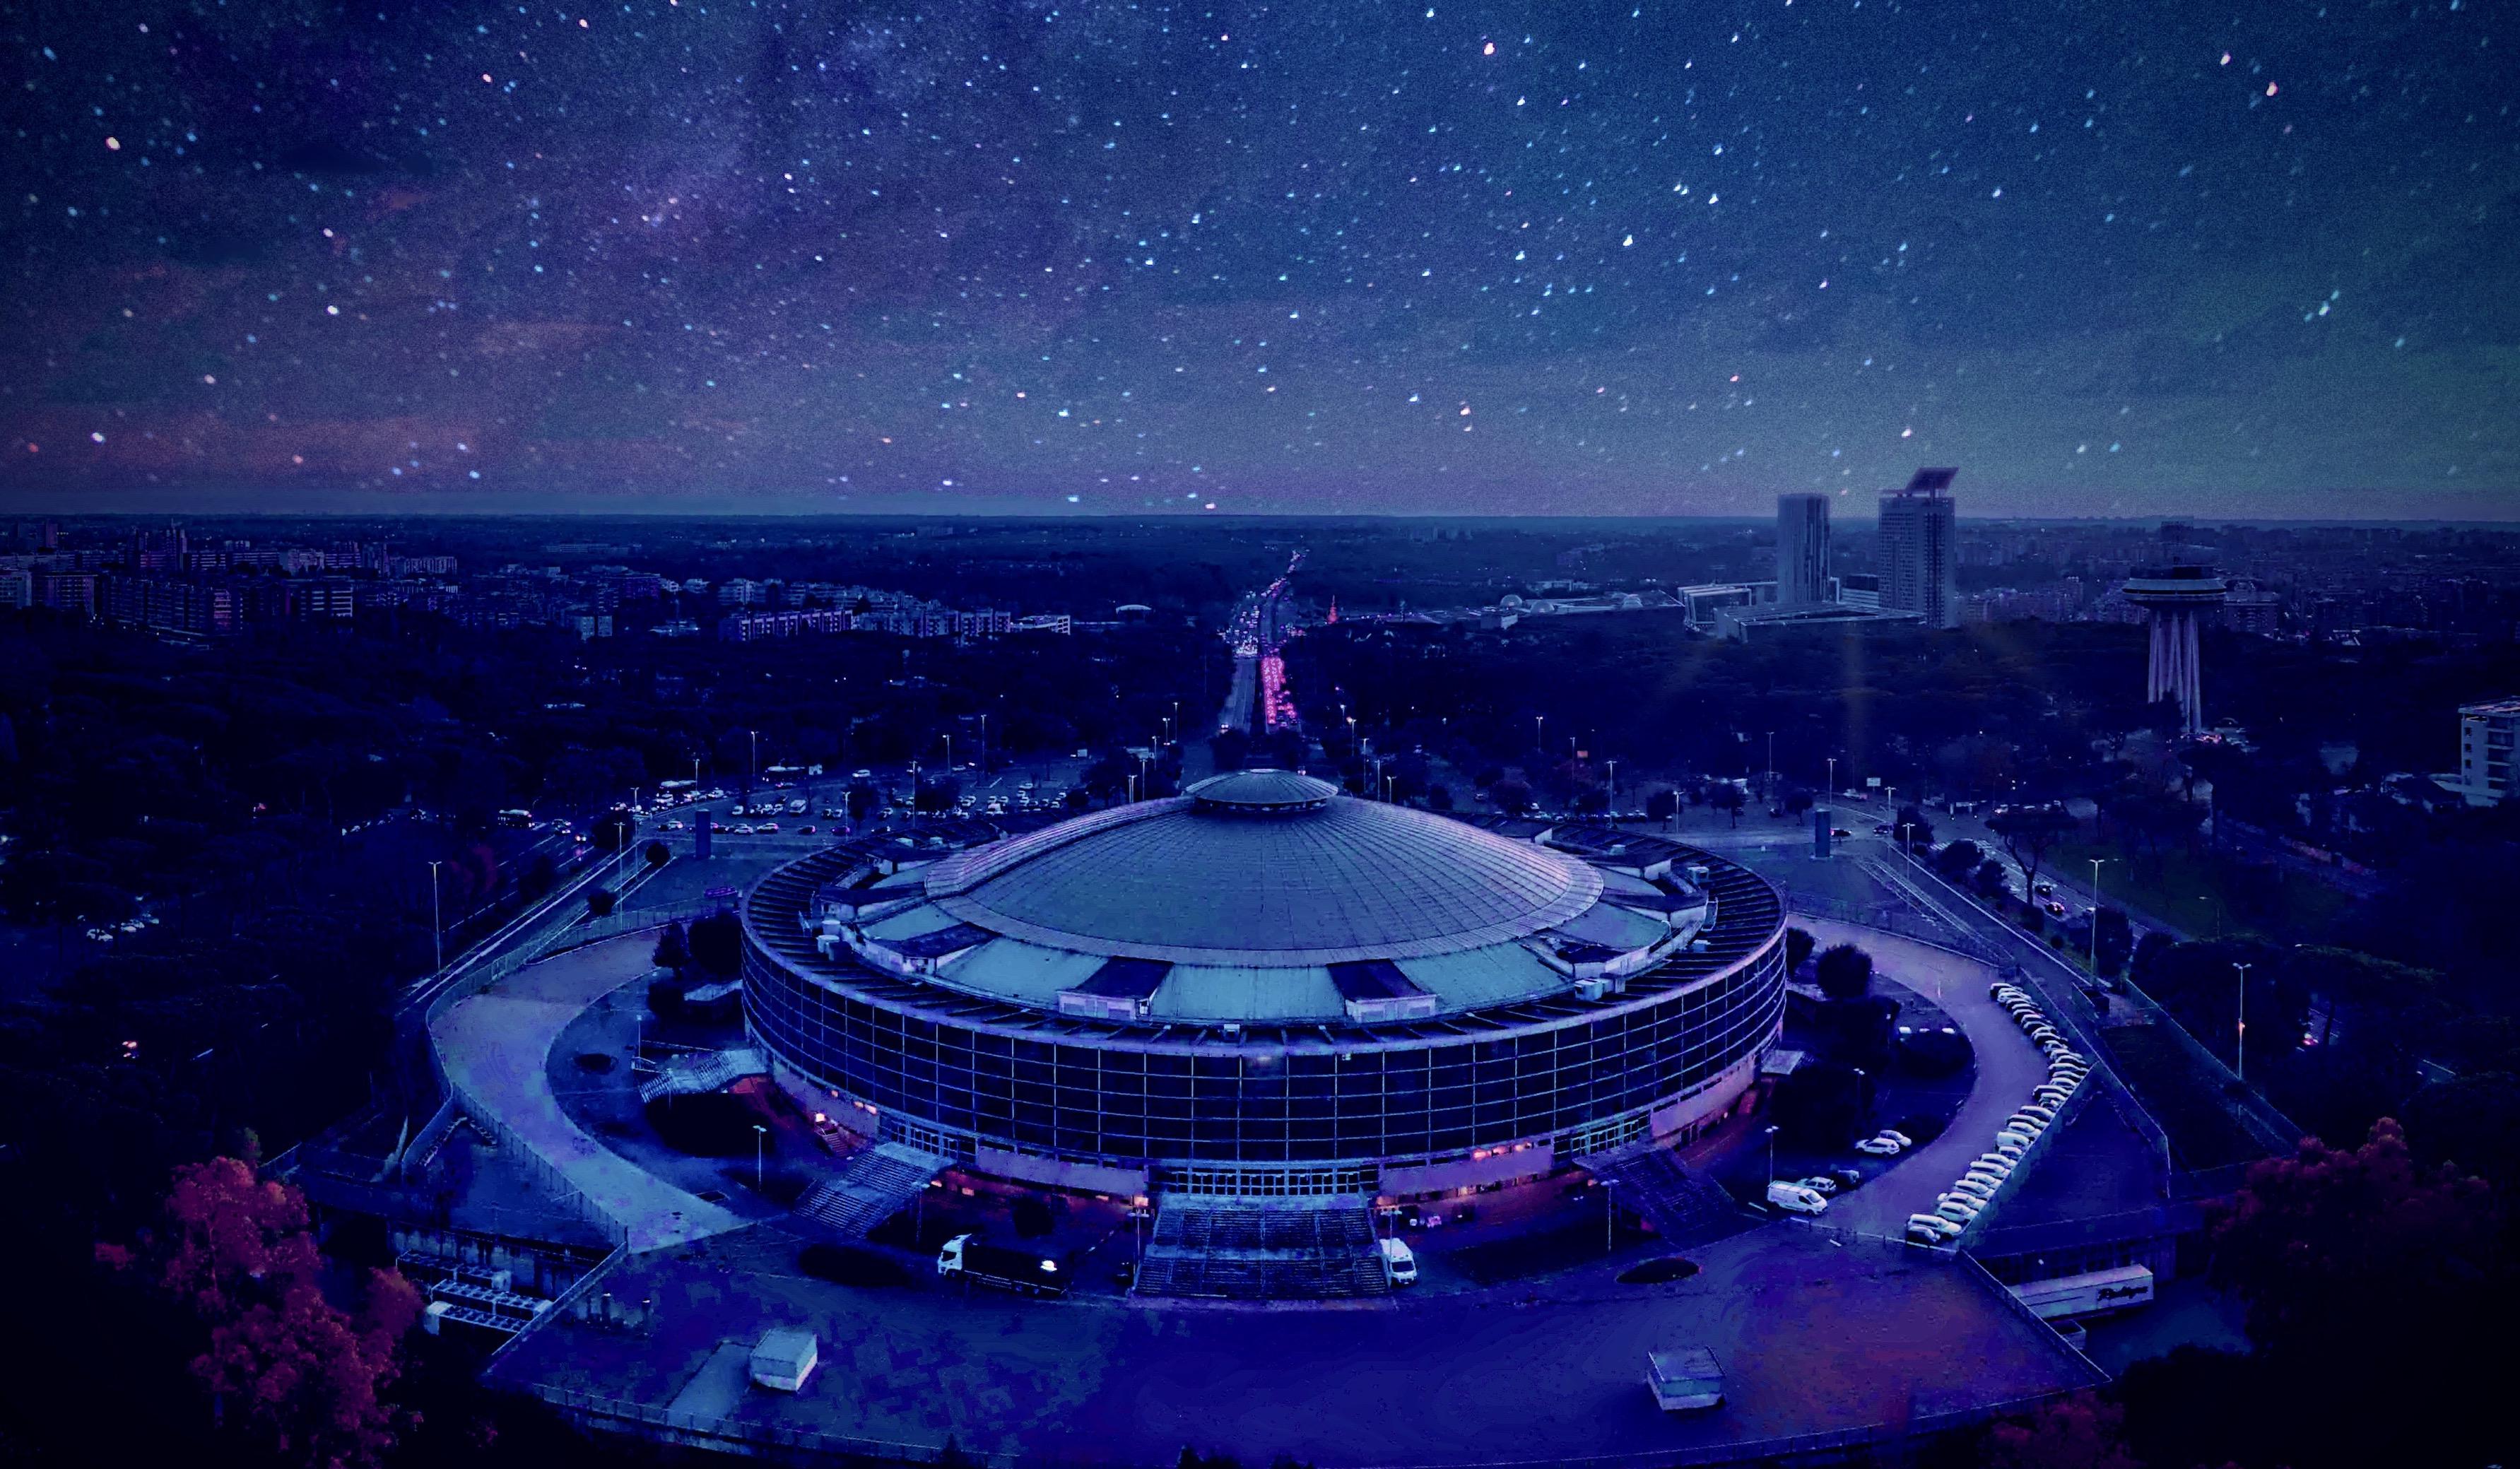 DJI SPORT PALACE UNDER STARS 2.jpeg